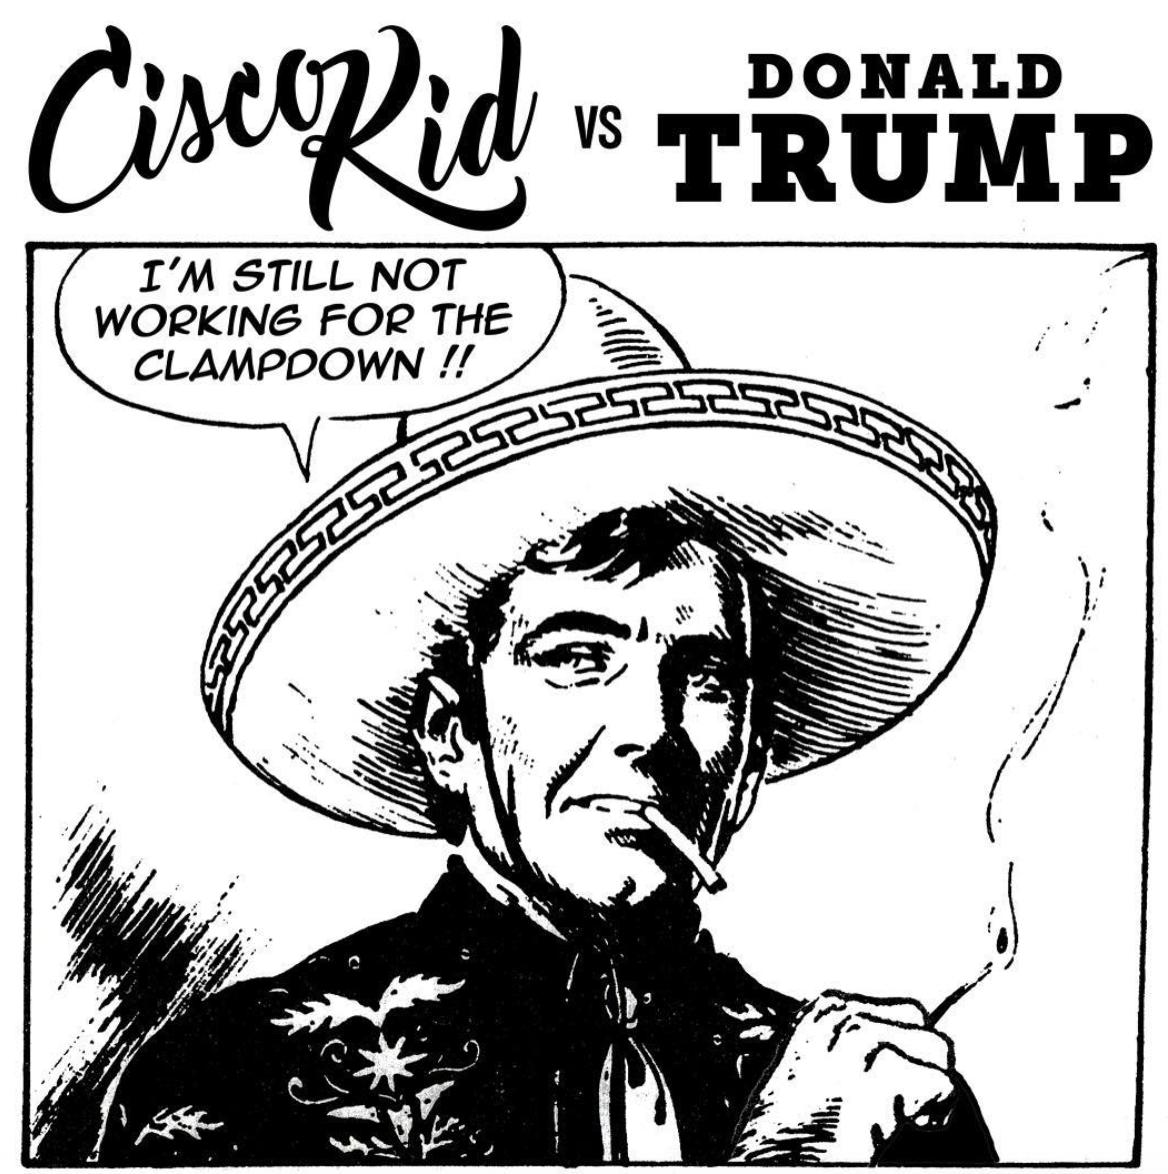 Cisco Kid Vs Donald Trump Clampdown